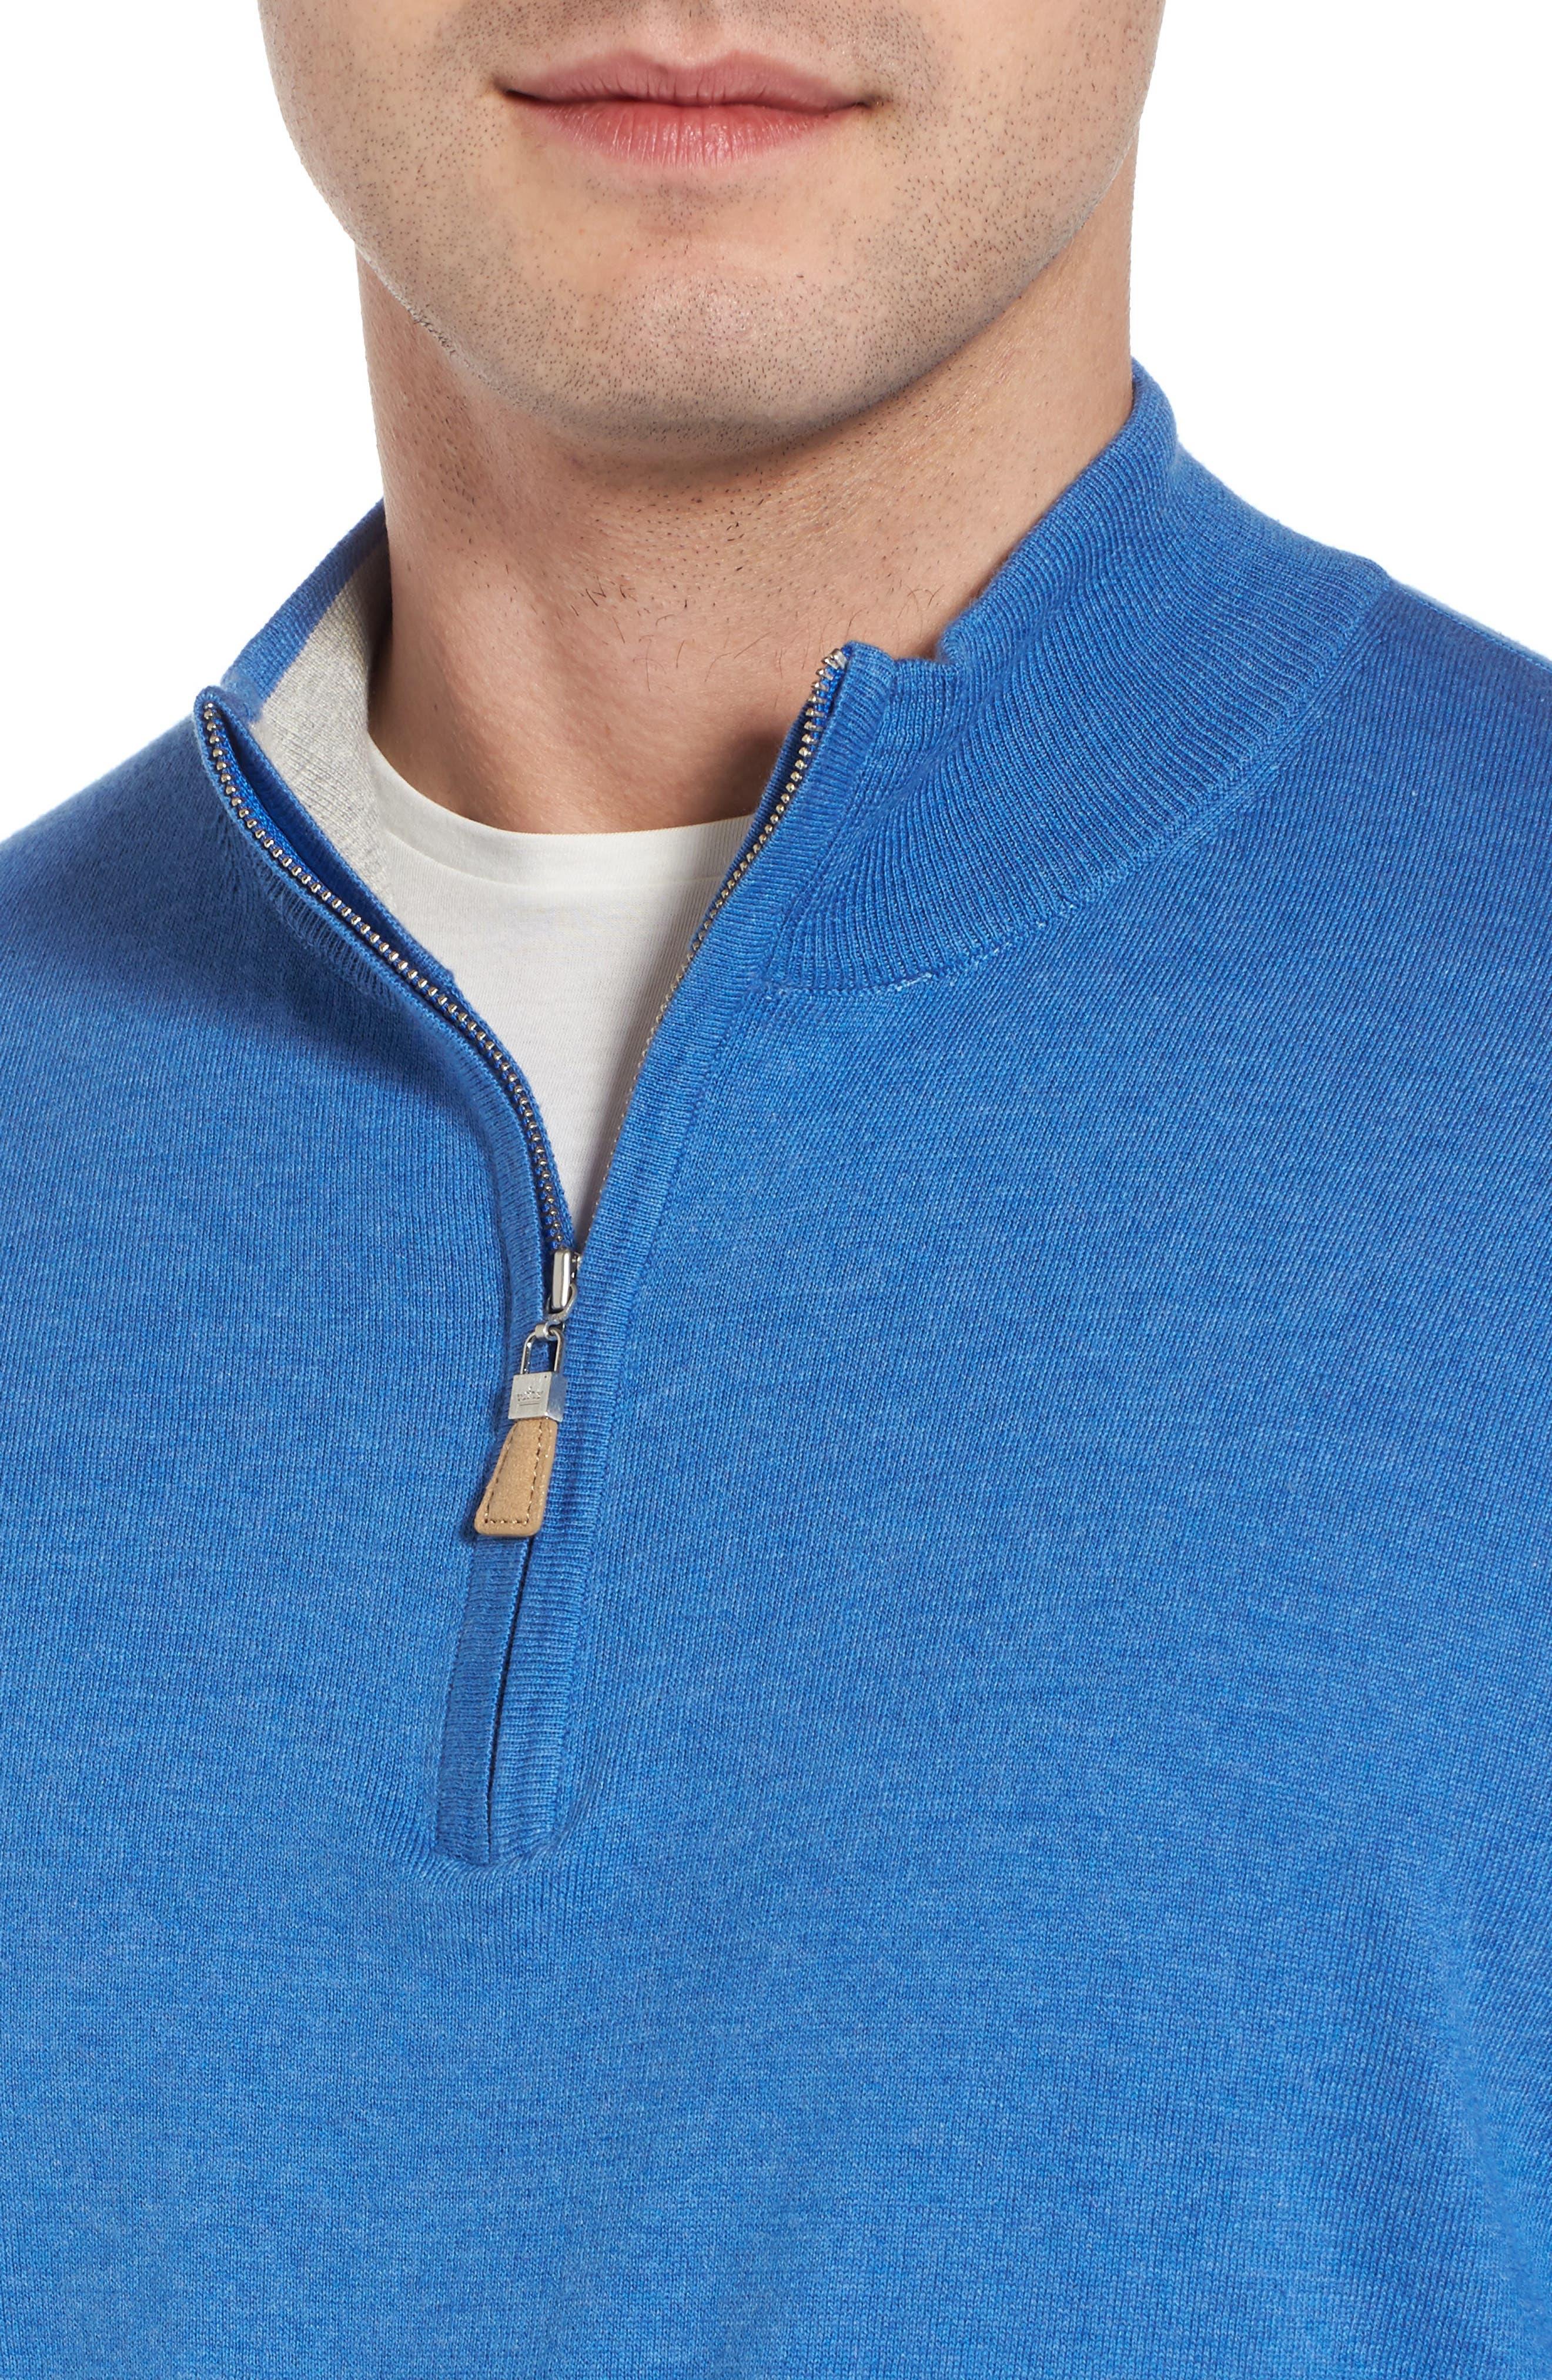 Crown Soft Quarter-Zip Pullover,                             Alternate thumbnail 4, color,                             Boardwalk Blue